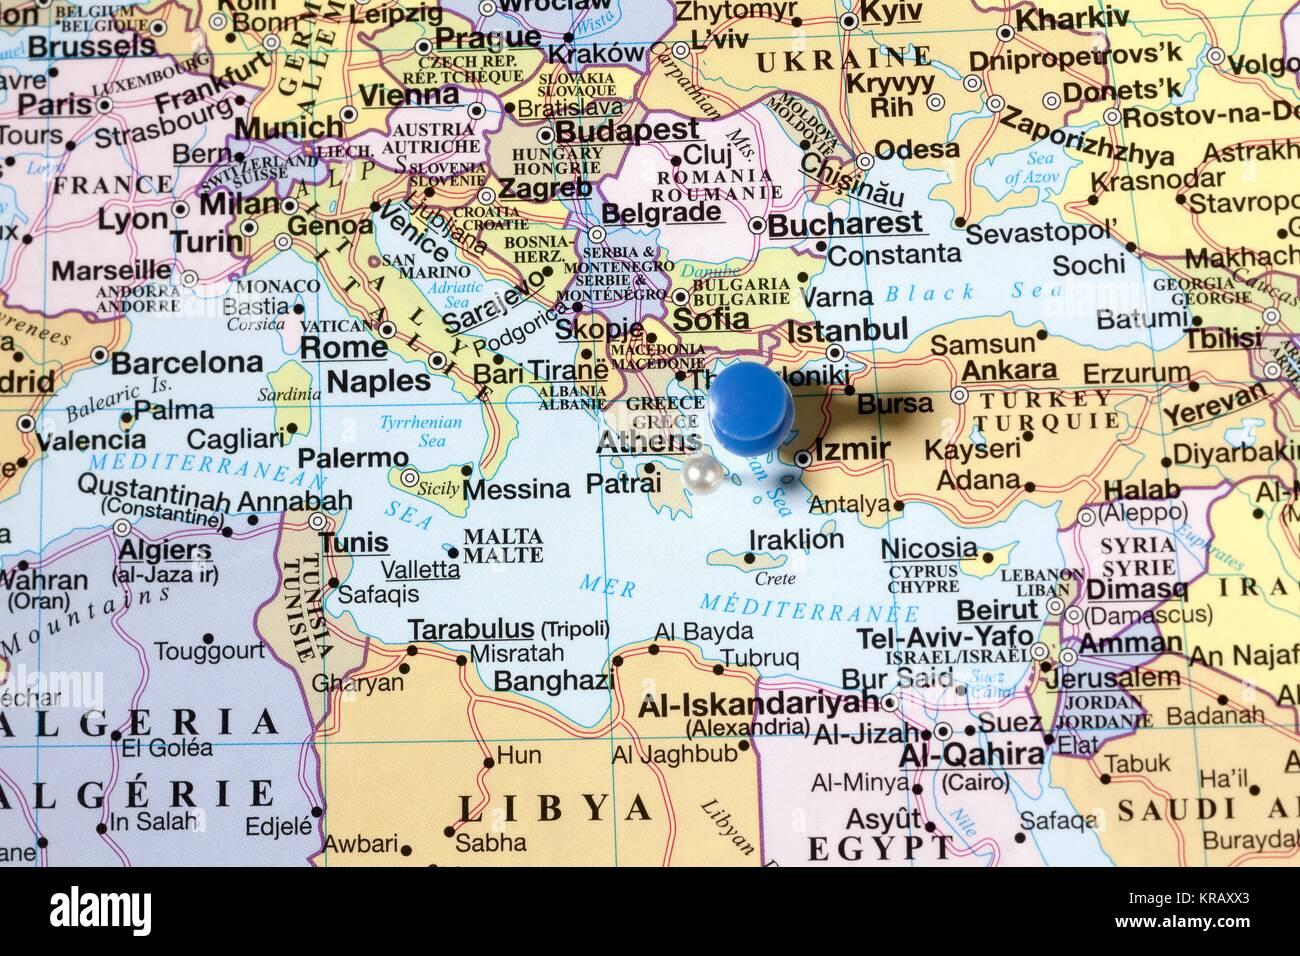 Blue push pins on world map stock photo royalty free image blue push pins on world map sciox Choice Image